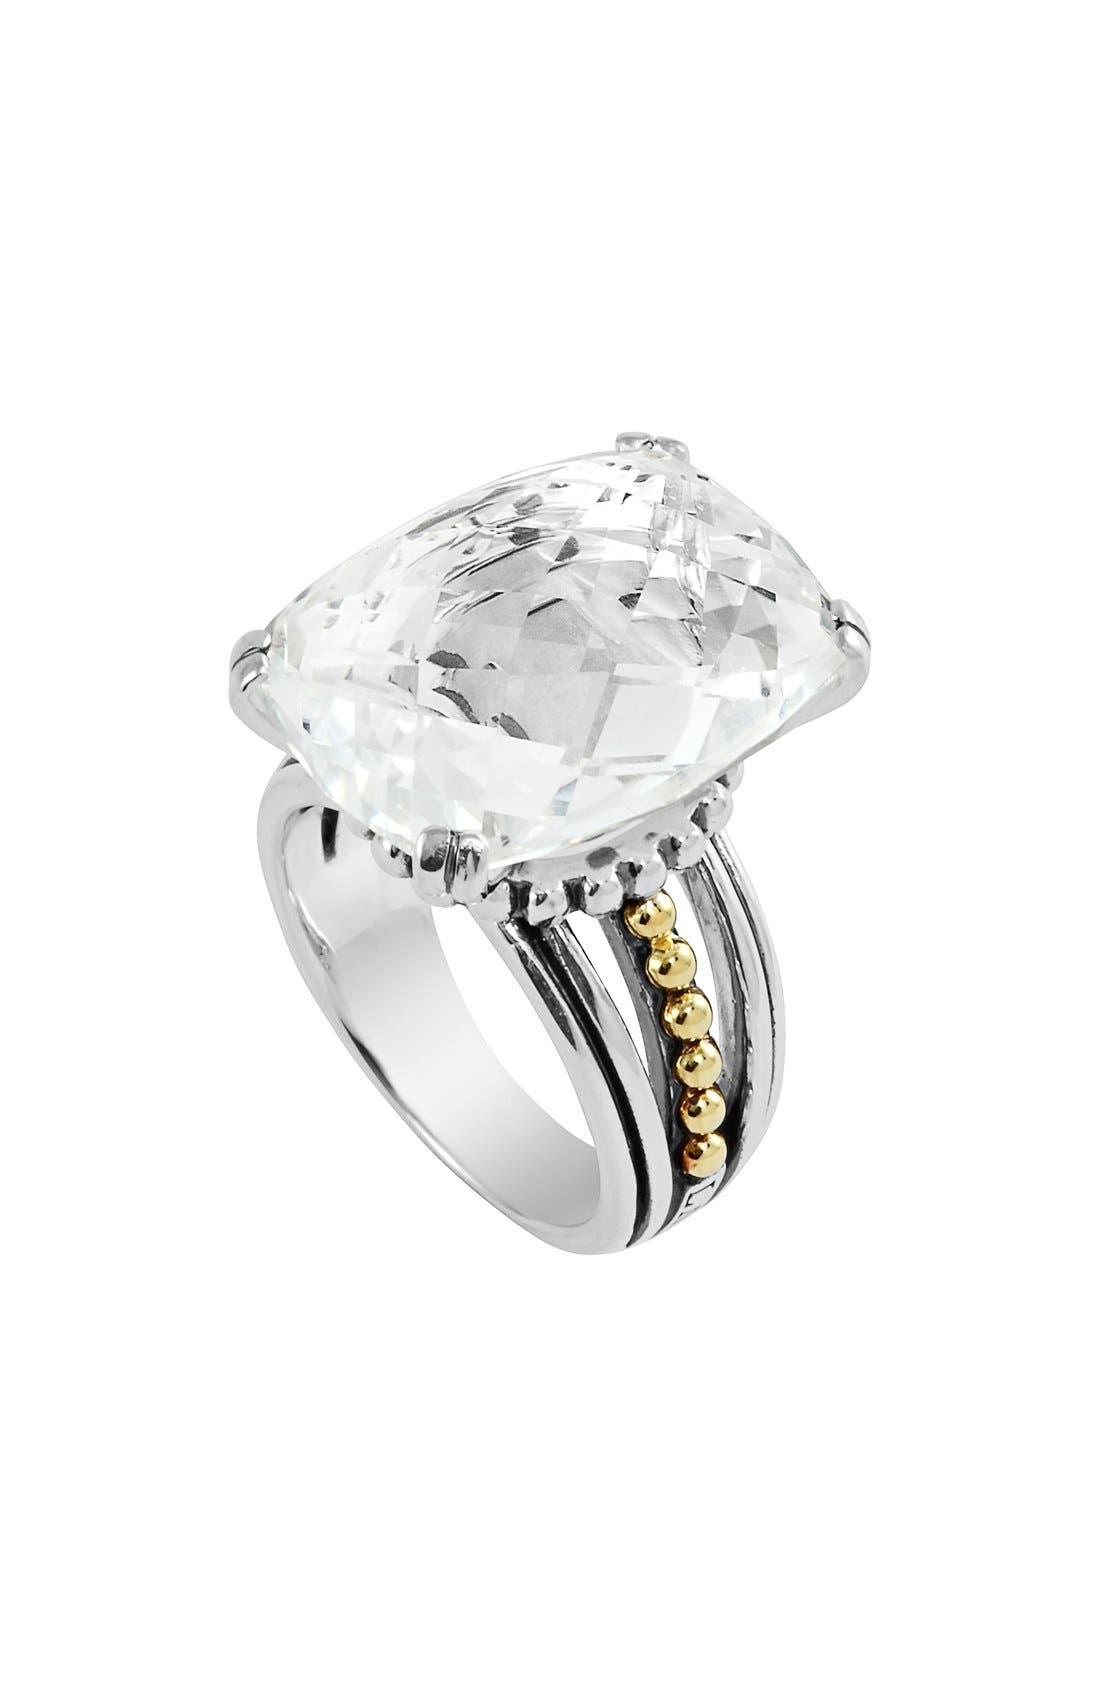 Alternate Image 1 Selected - LAGOS 'Prism' Stone Ring